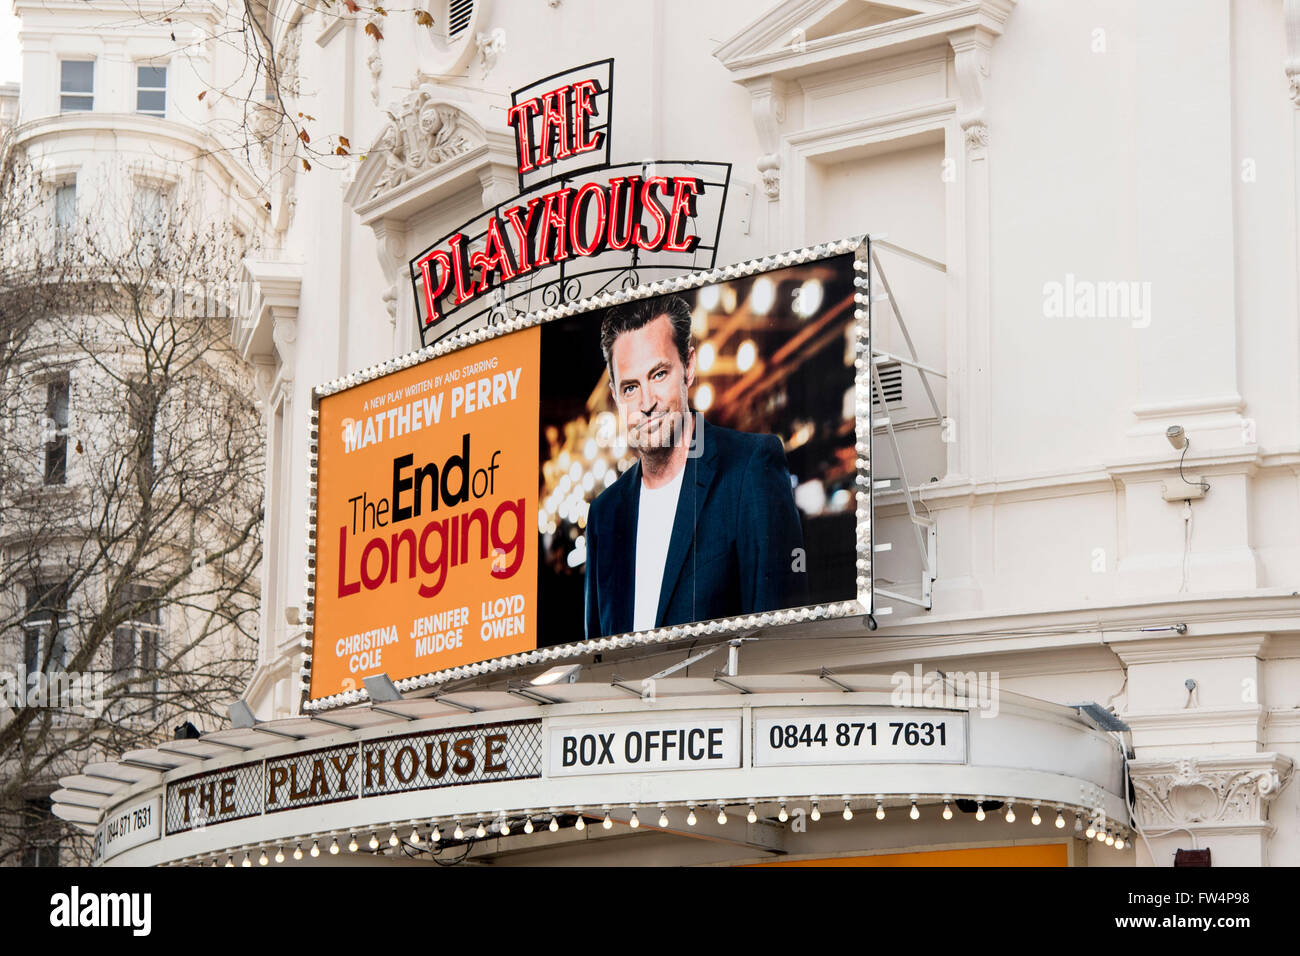 Matt Matthew Perry The End of Longing Playhouse - Stock Image